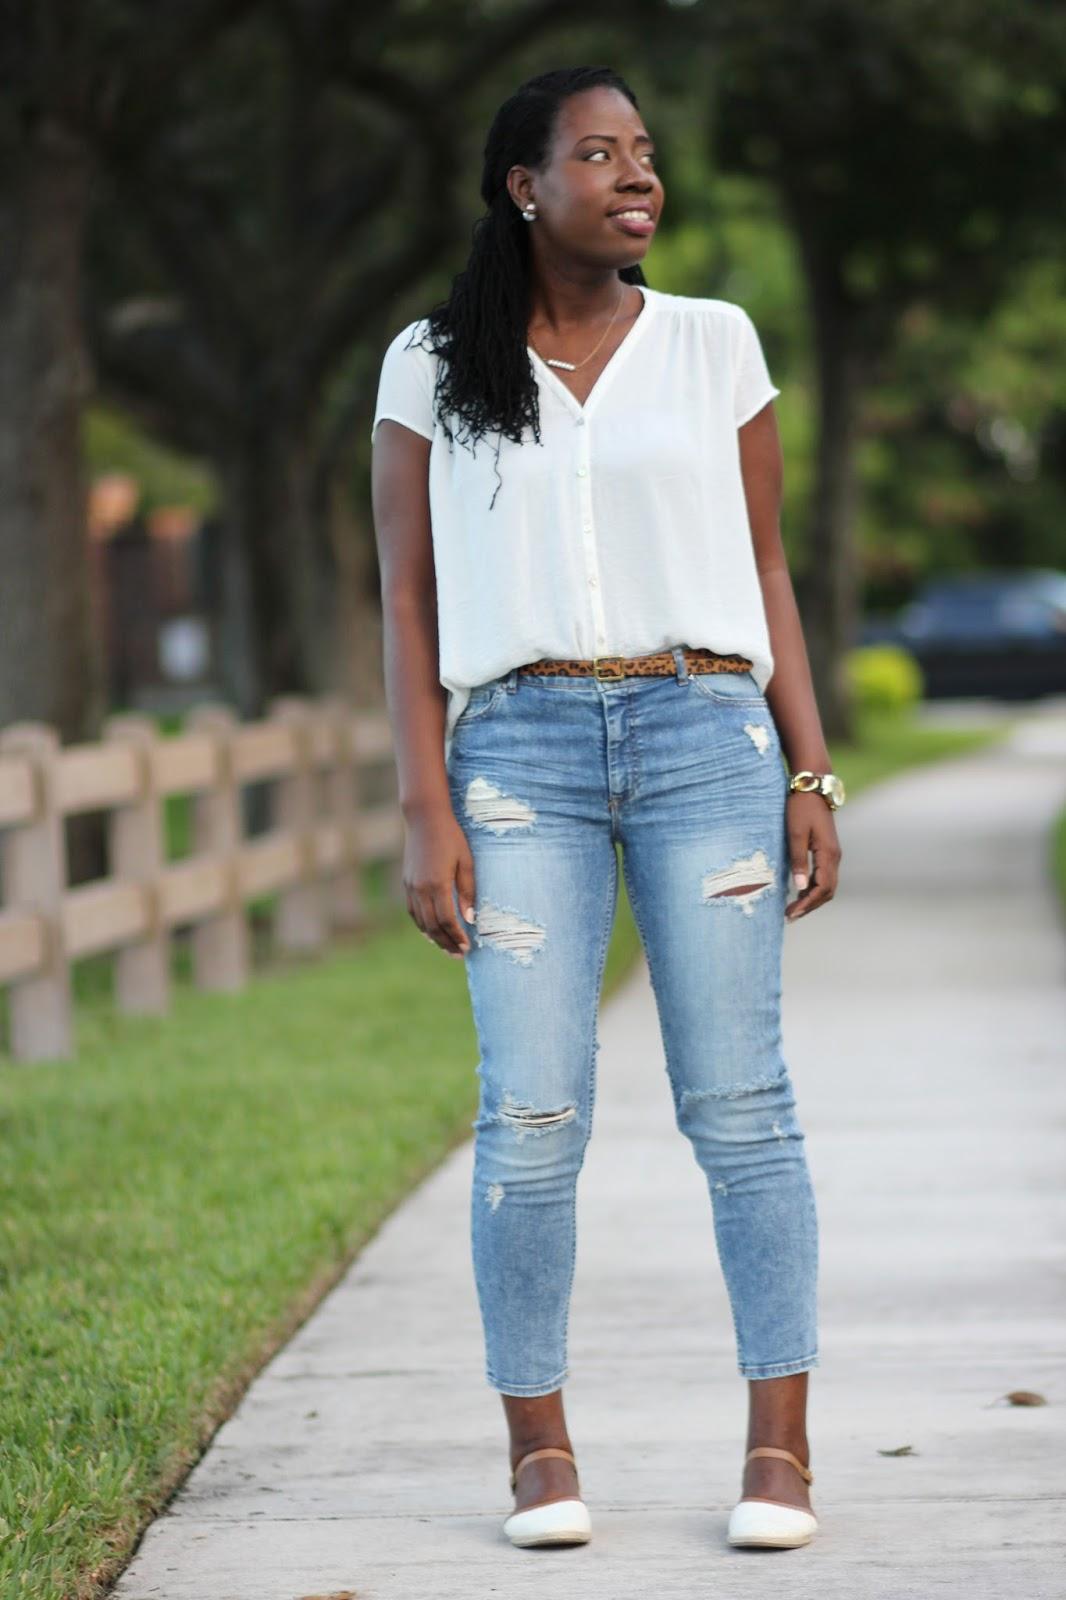 Kreyolau0026#39;s Journeys What I Wore The Girlfriend Jeans